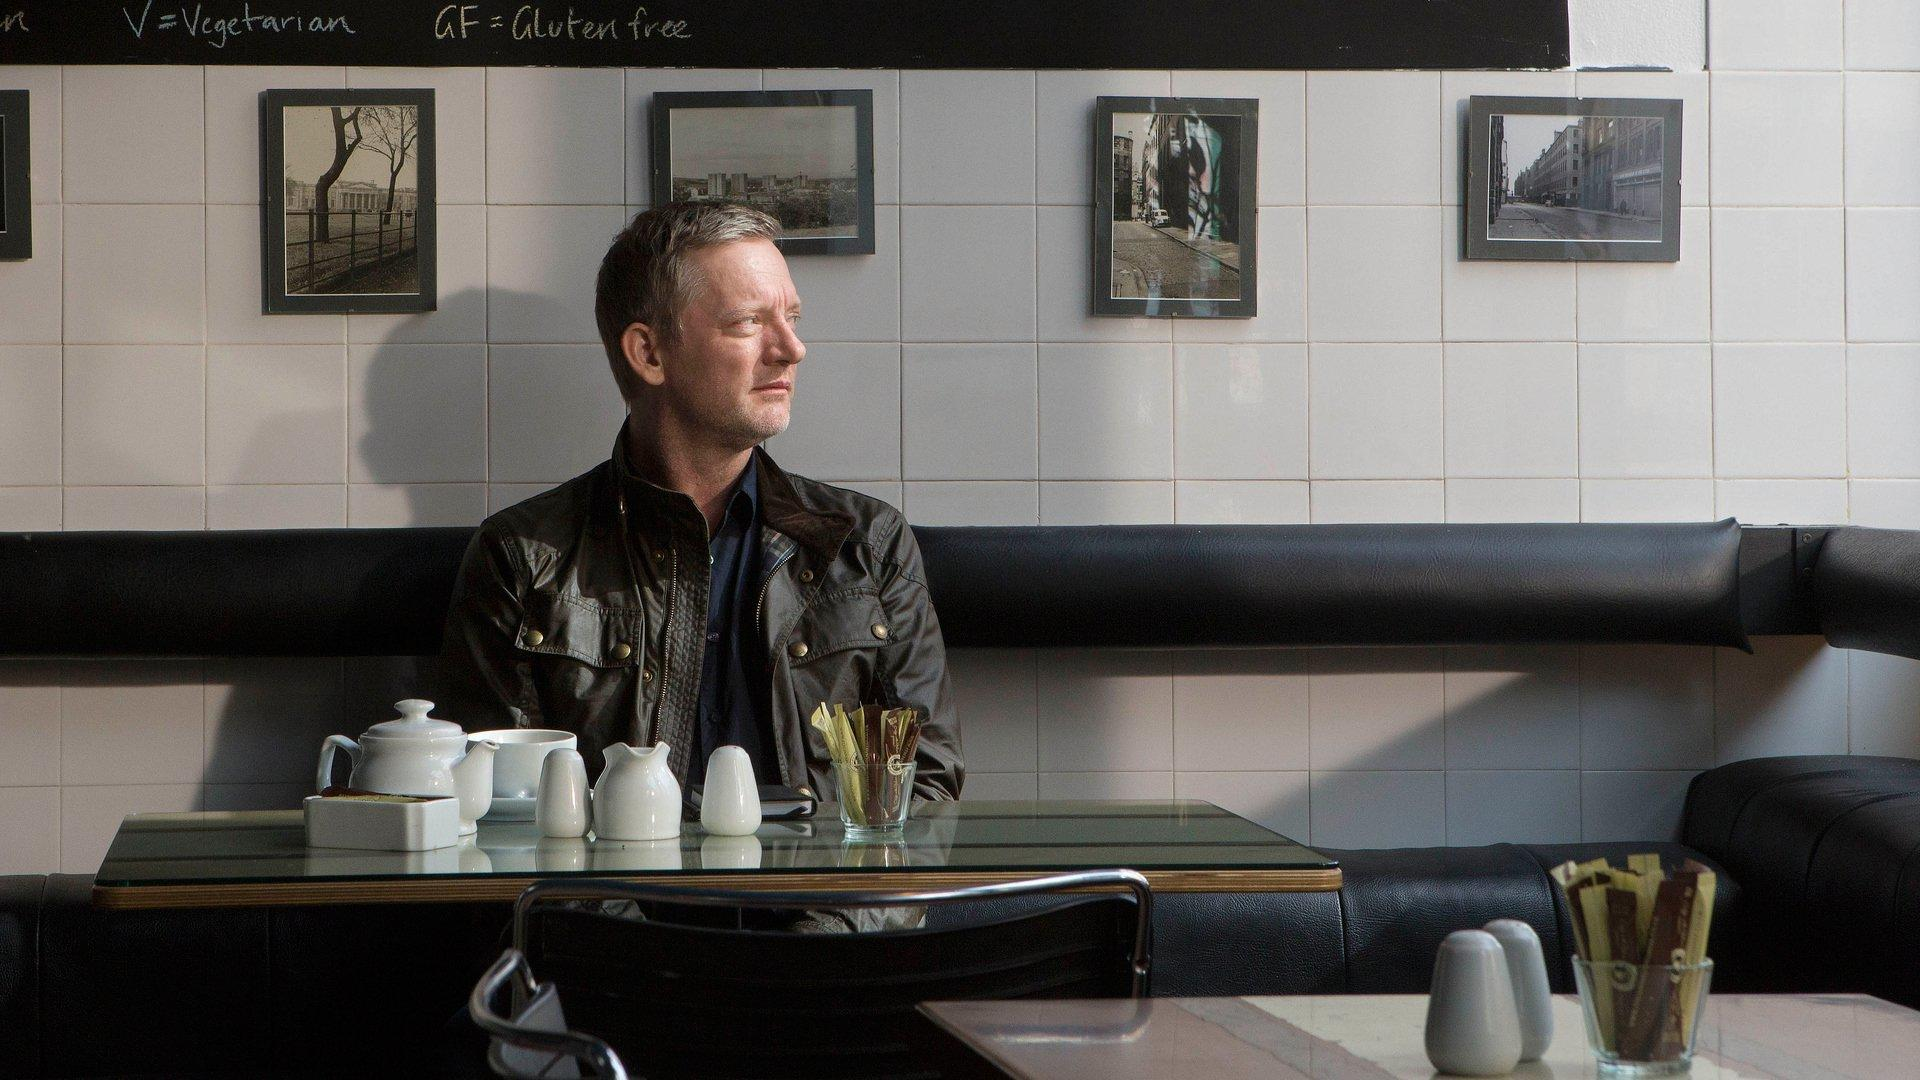 Series 3, Episode 5 Summary - Shetland Season 3, Episode 5 Episode Guide